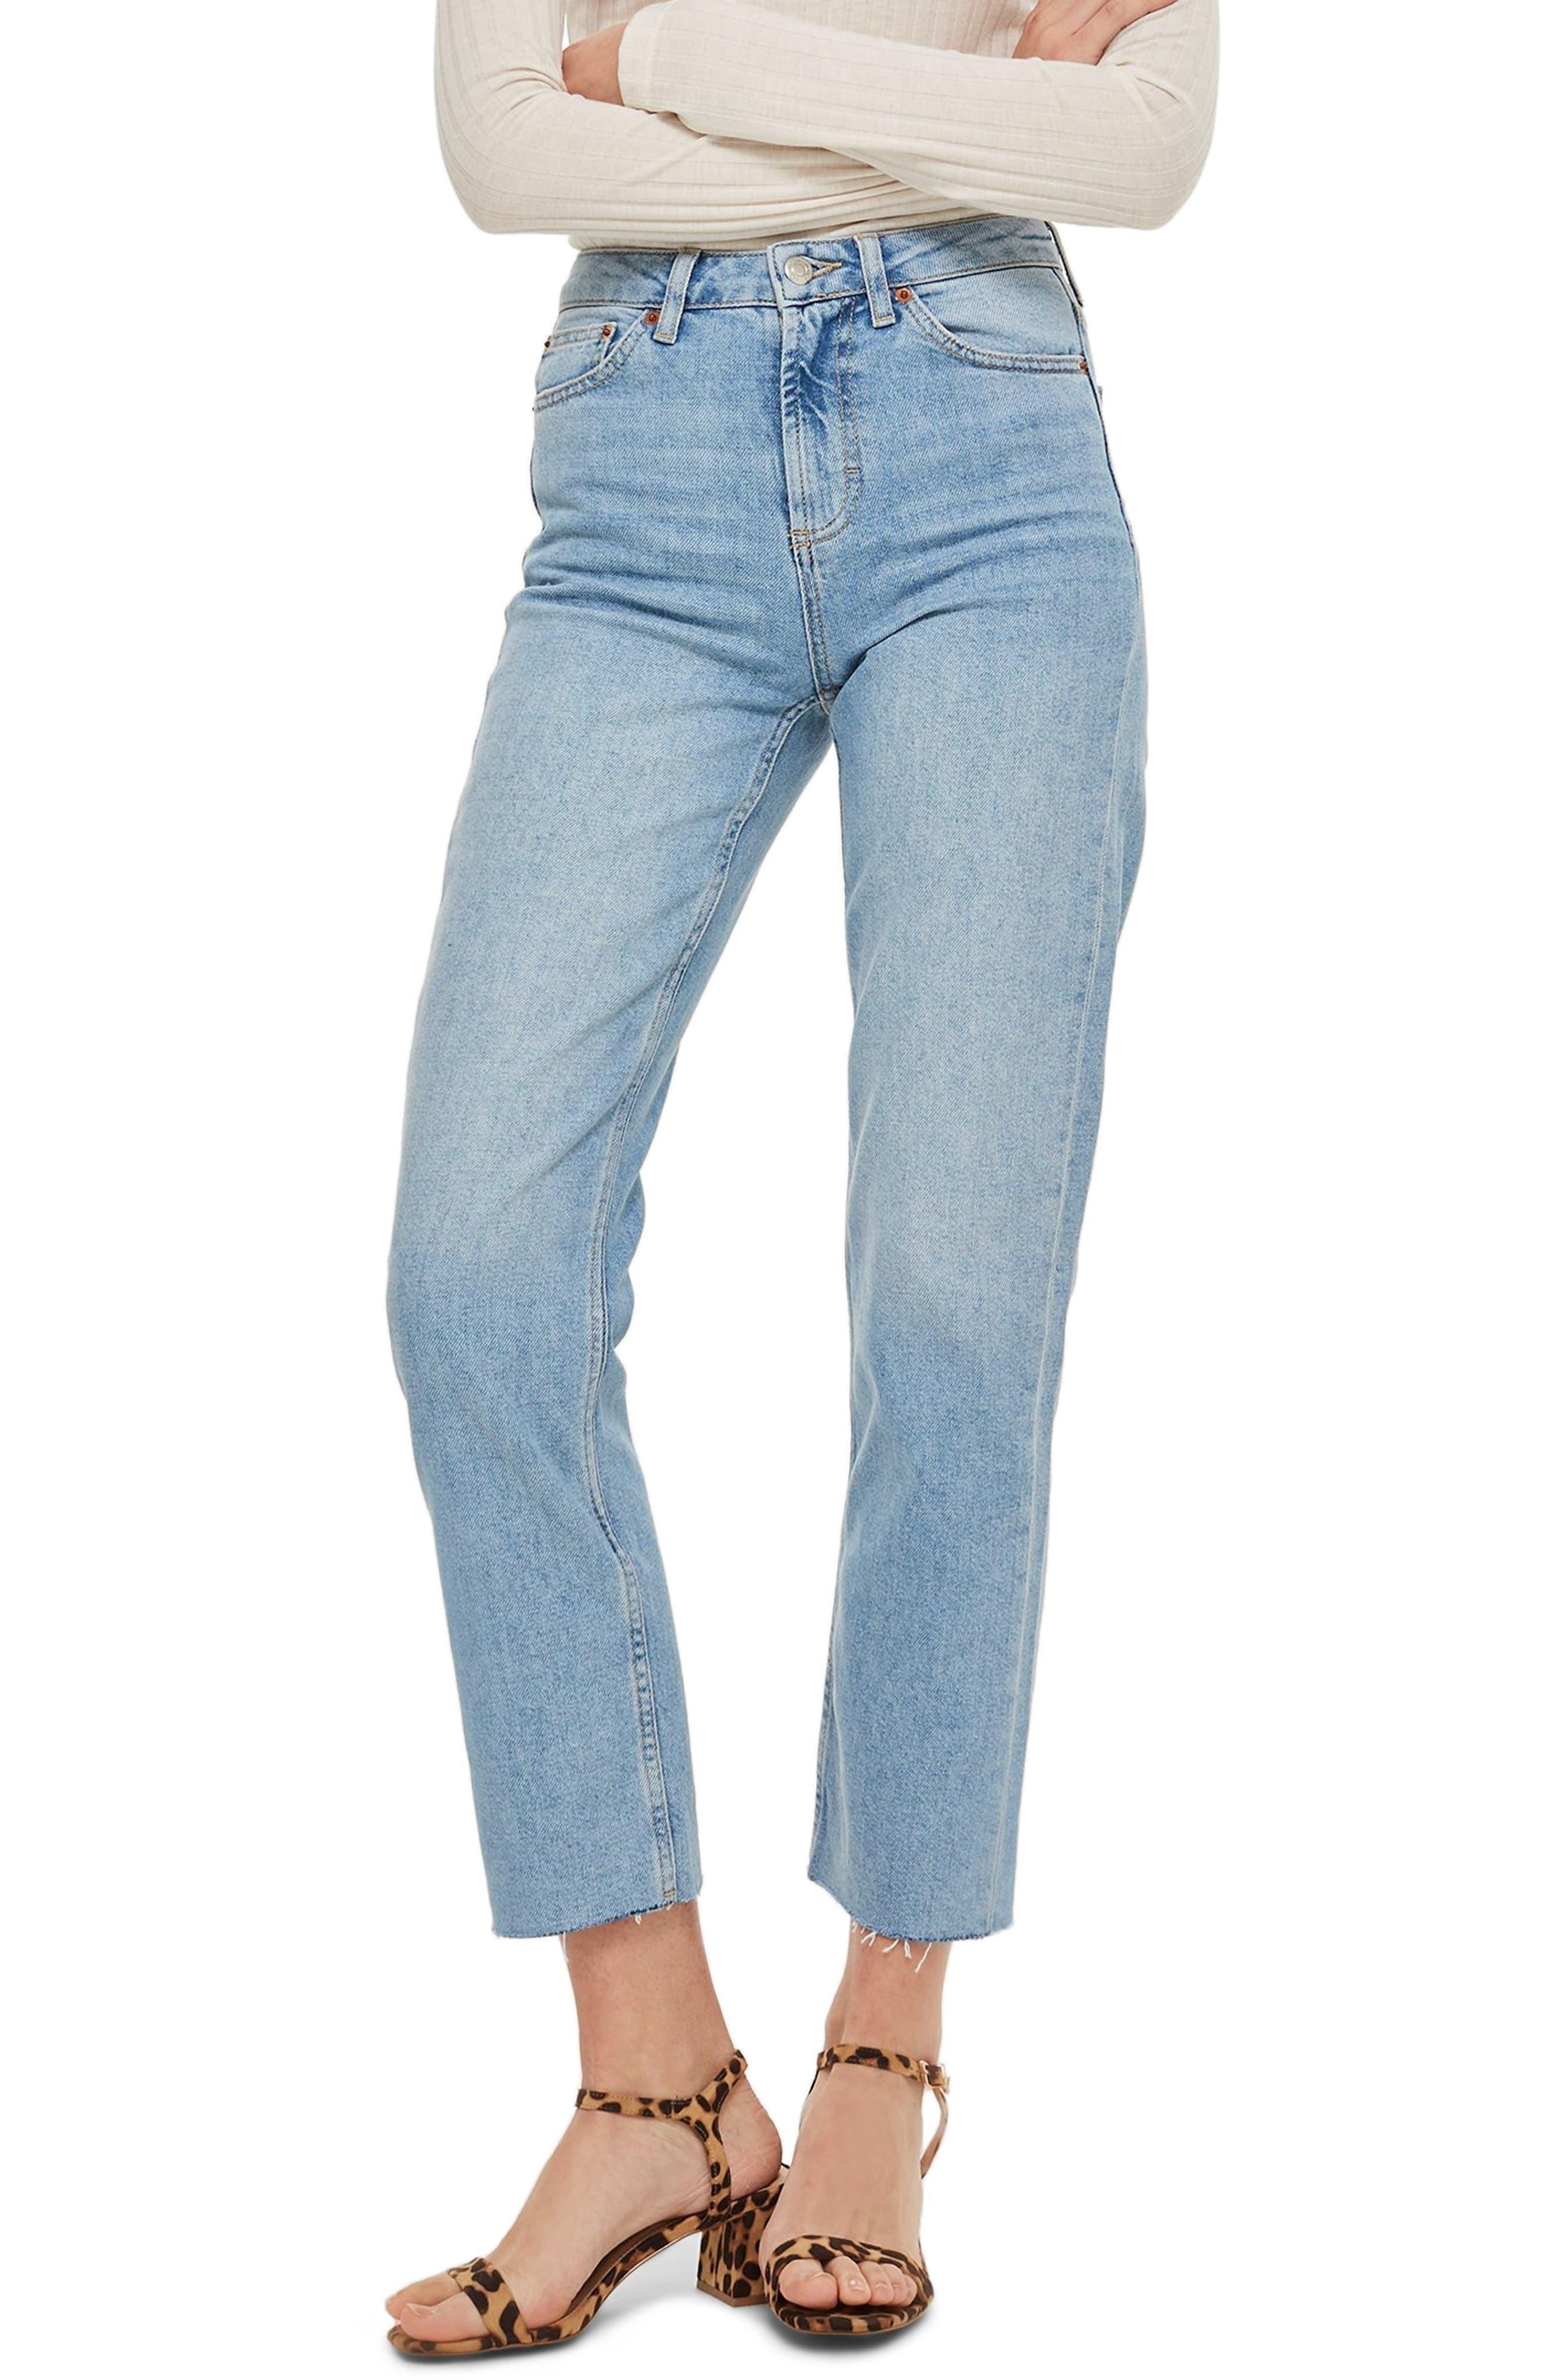 TOPSHOP, Raw Hem Straight Leg Jeans, Main thumbnail 1, color, BLEACH